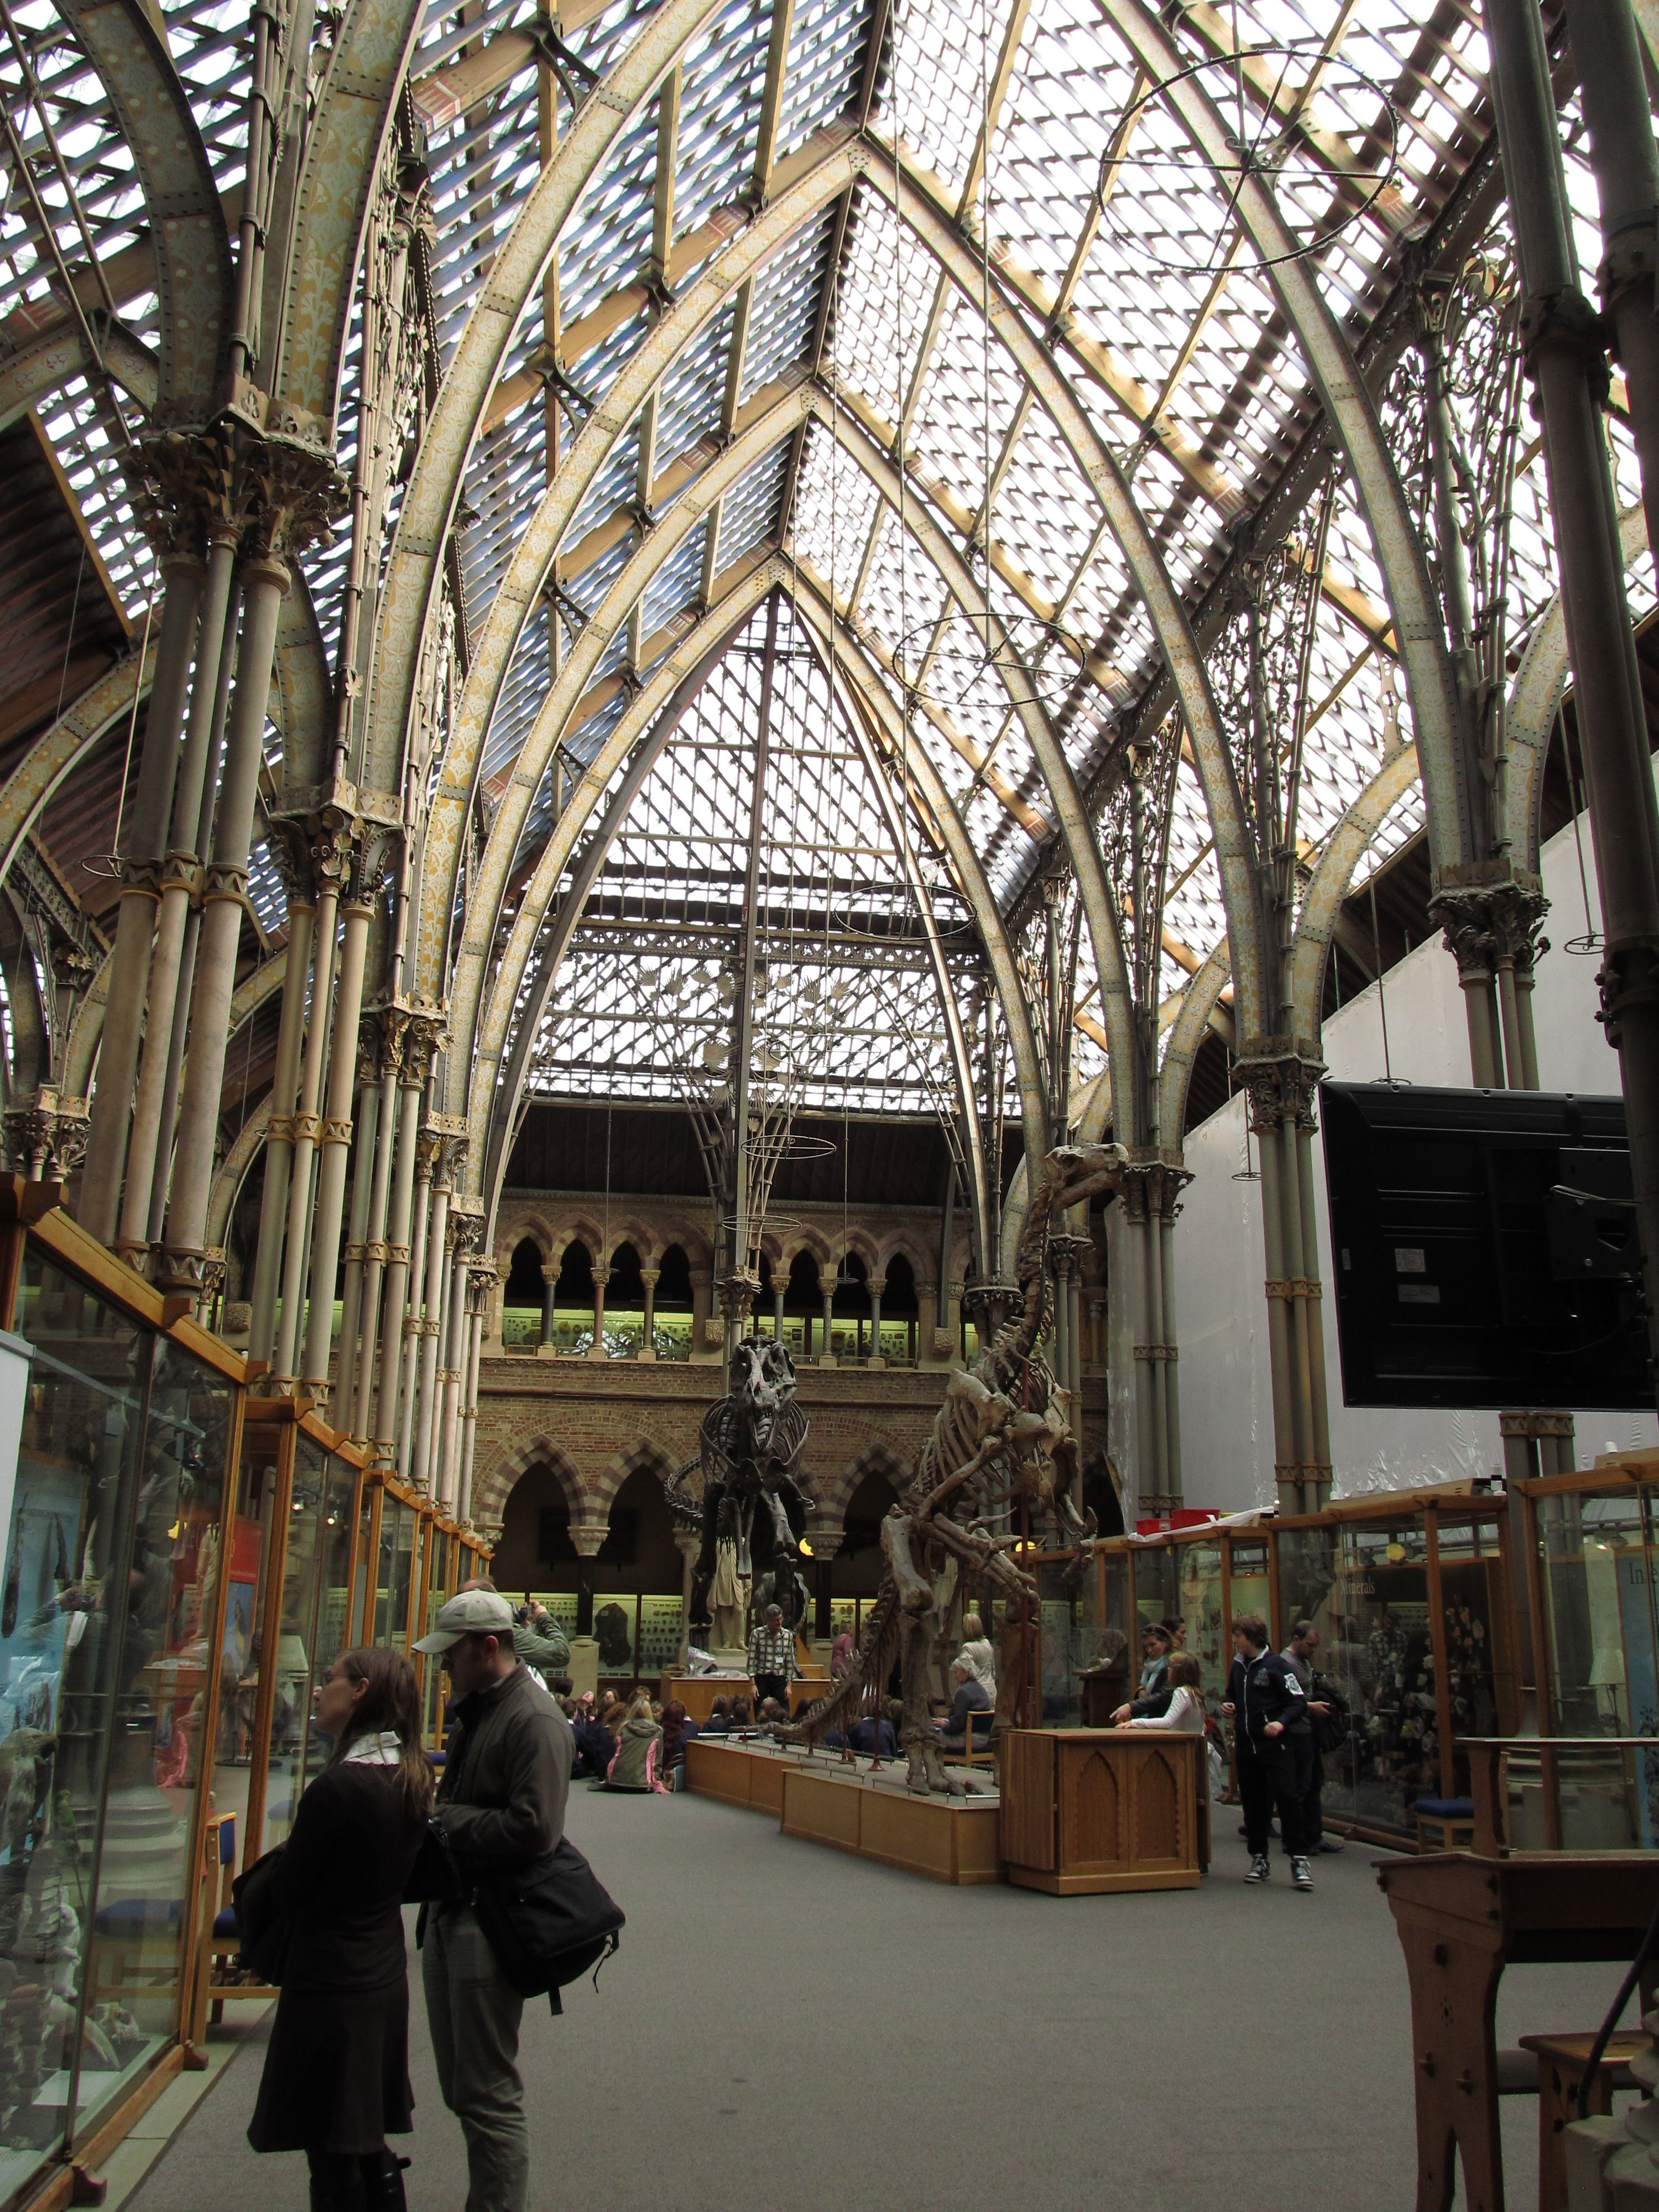 Genial Výsledek Obrázku Pro Oxford Museum Of Natural Science Architecture